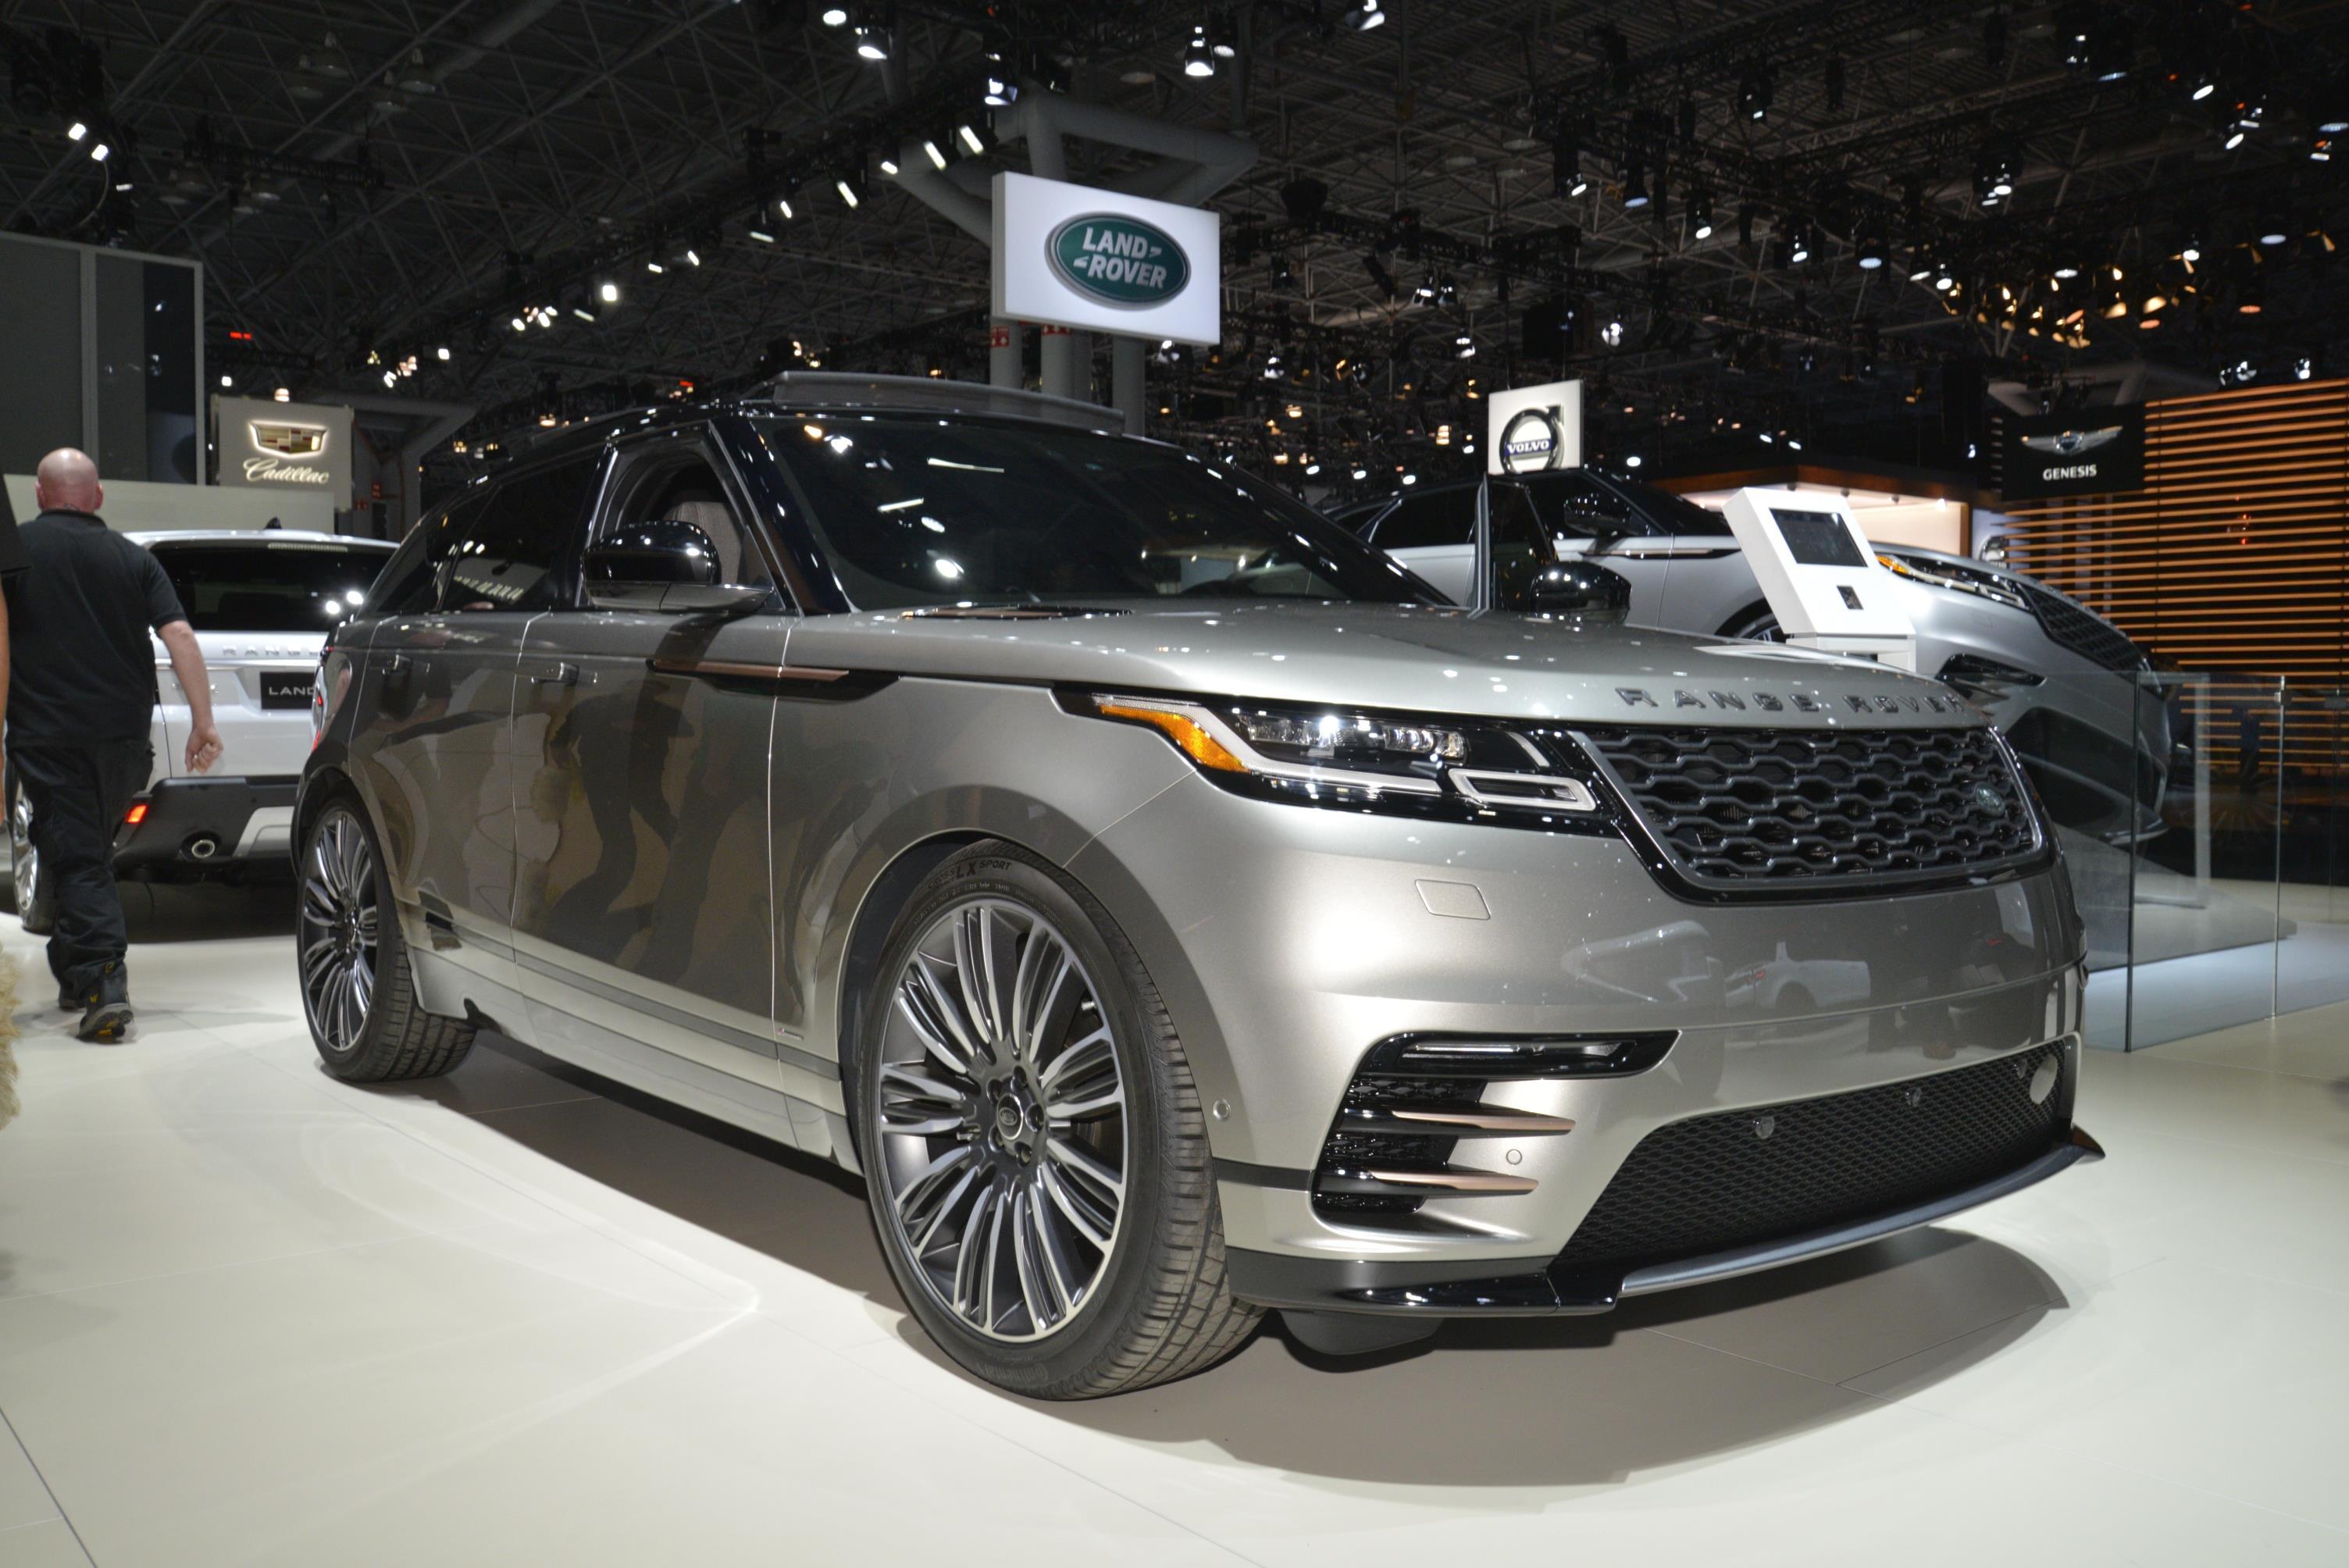 New York Auto Show 2017 (275)